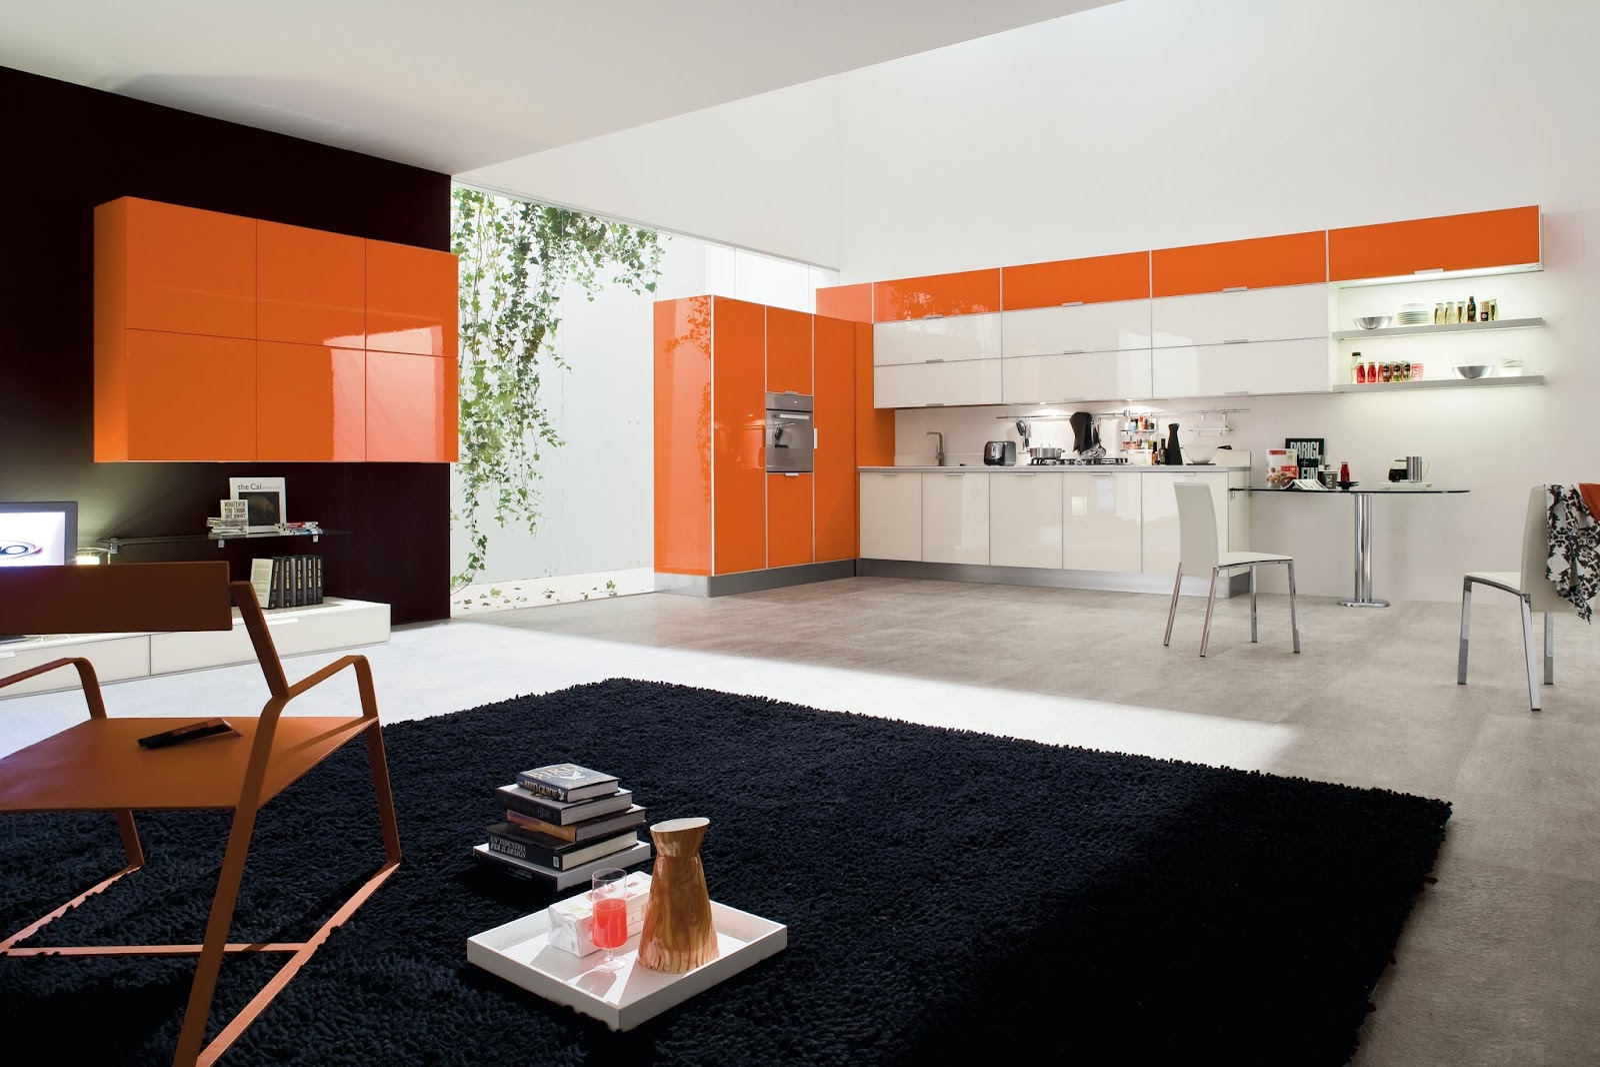 cuisine direct usine eco stone plan de travail en granit direct usine plan de travail en granit. Black Bedroom Furniture Sets. Home Design Ideas